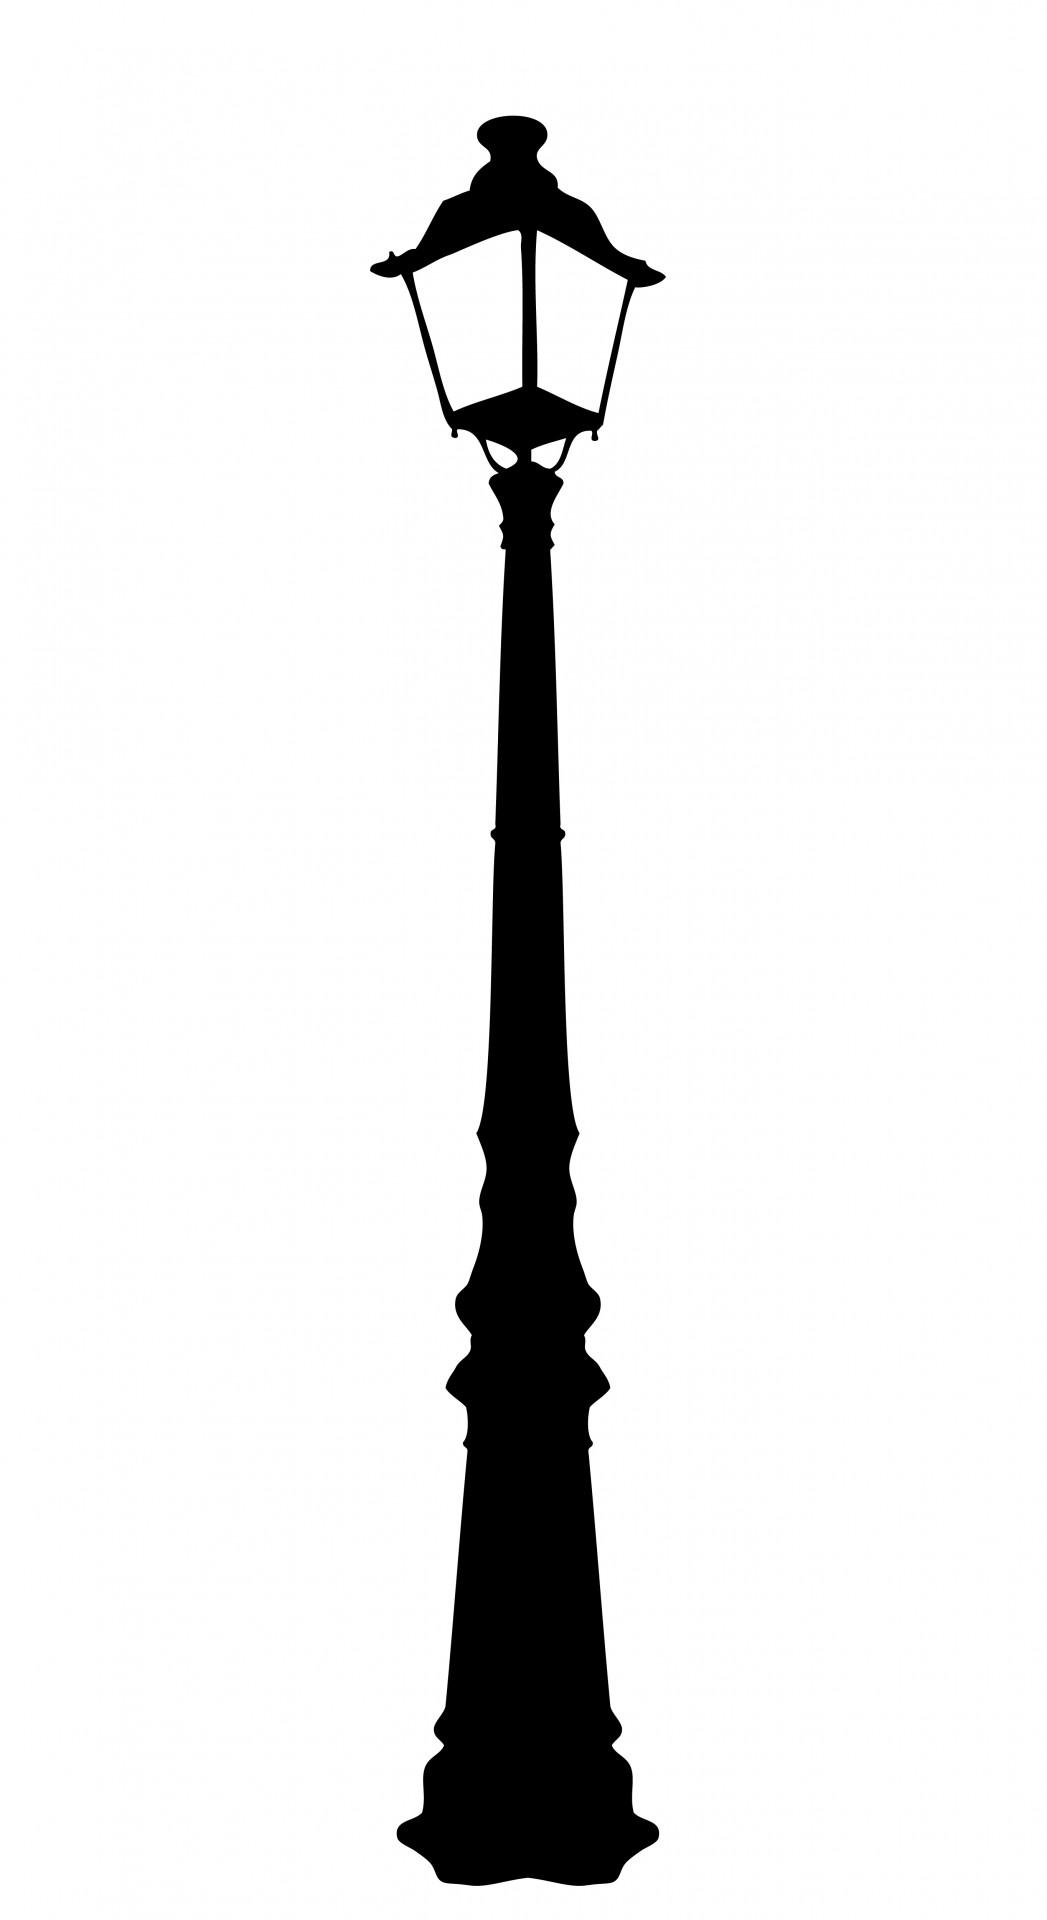 Street Lamp Silhouette At Getdrawings